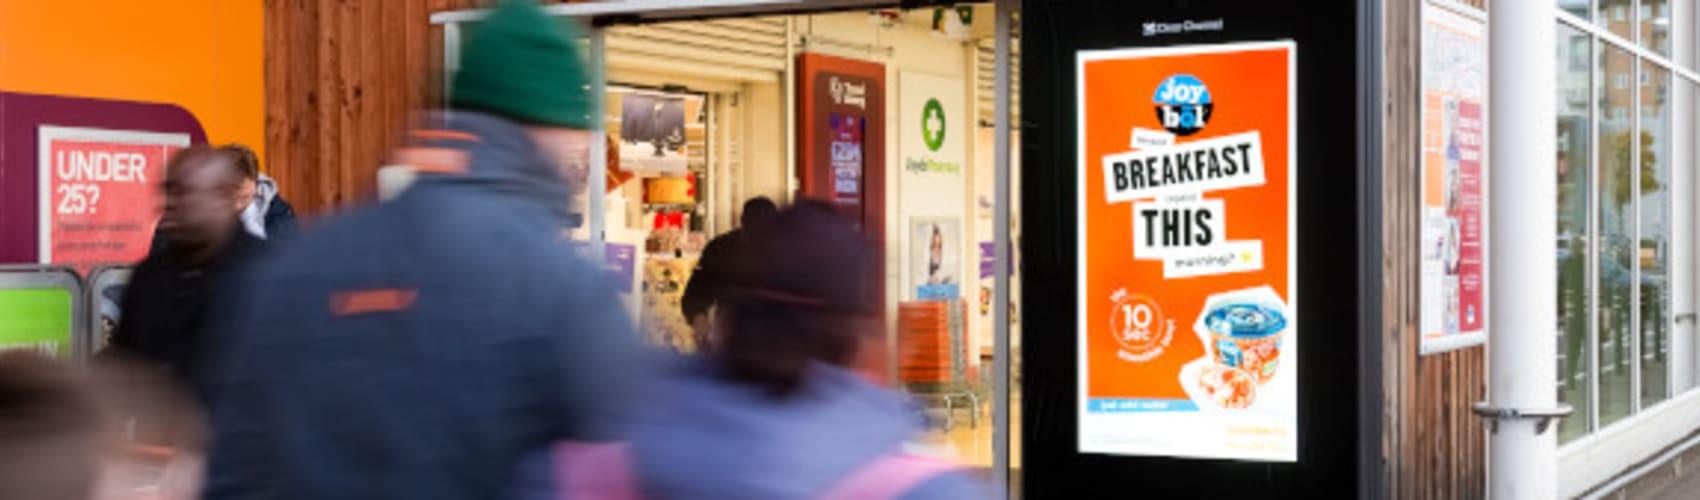 Kellogg's breakfast ad on Sainsbury's Live screen